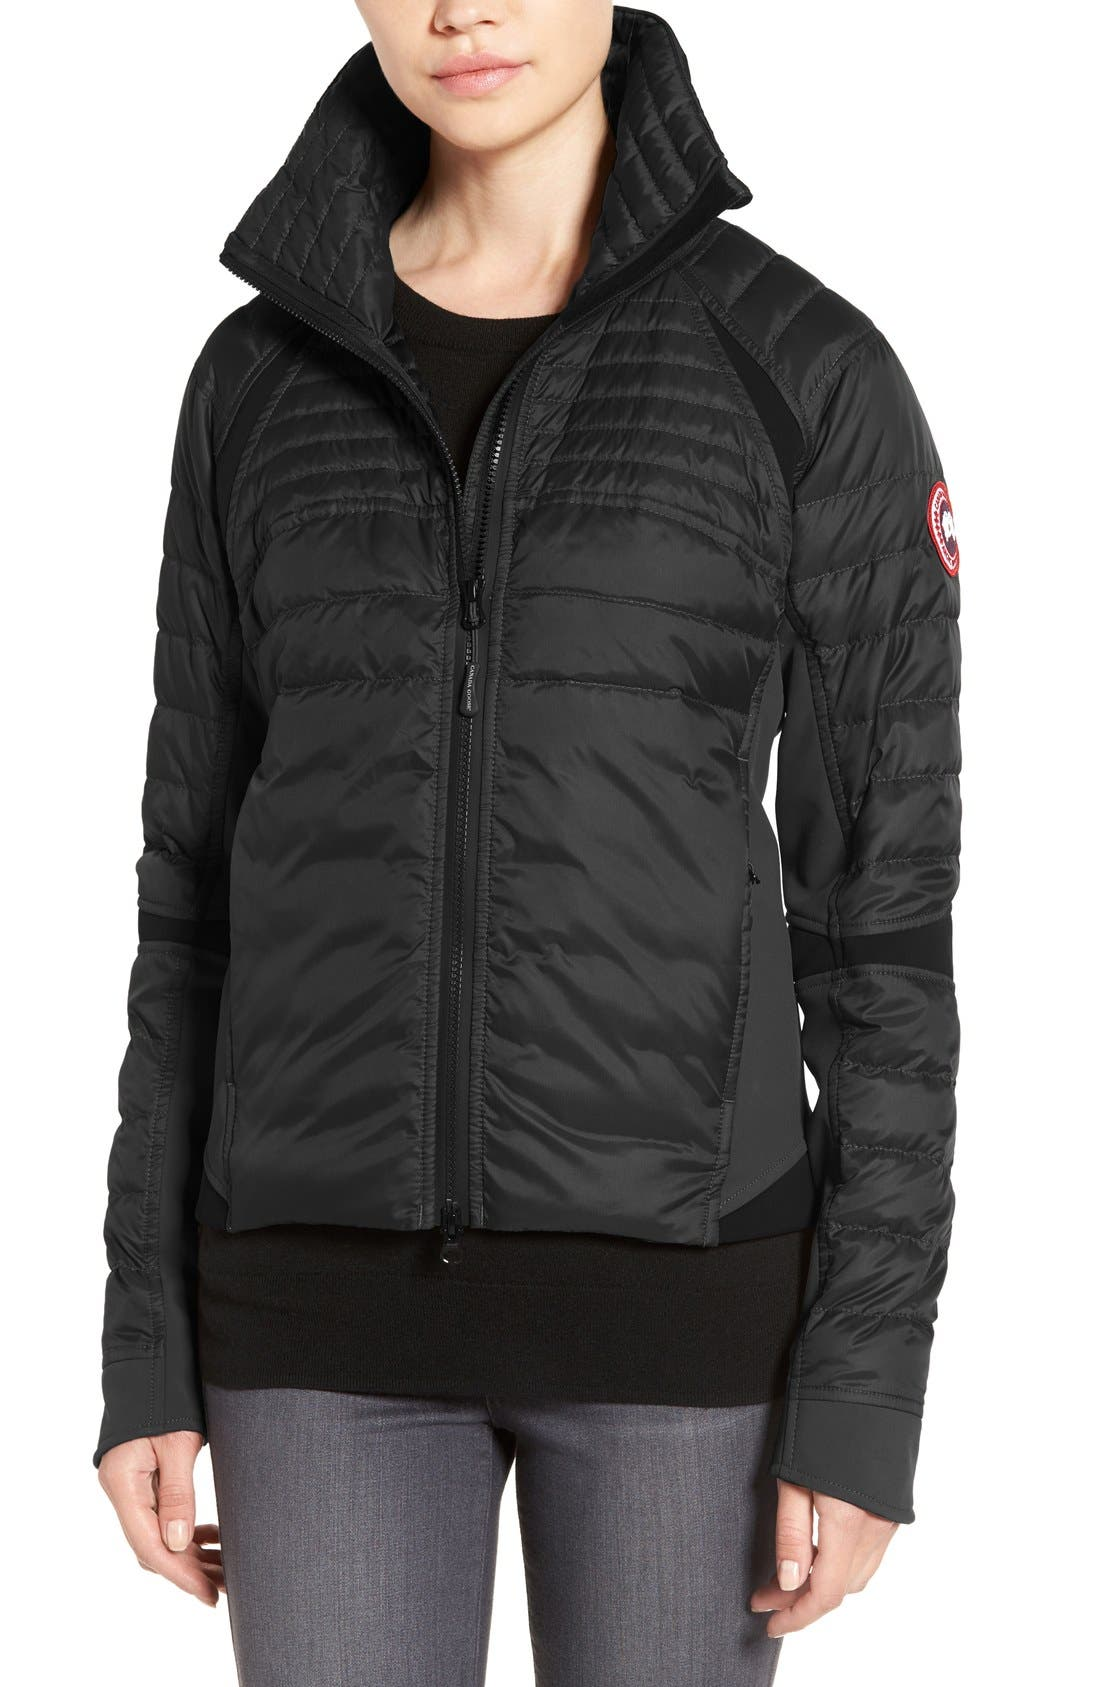 Alternate Image 1 Selected - Canada Goose Hybridge Perren Jacket